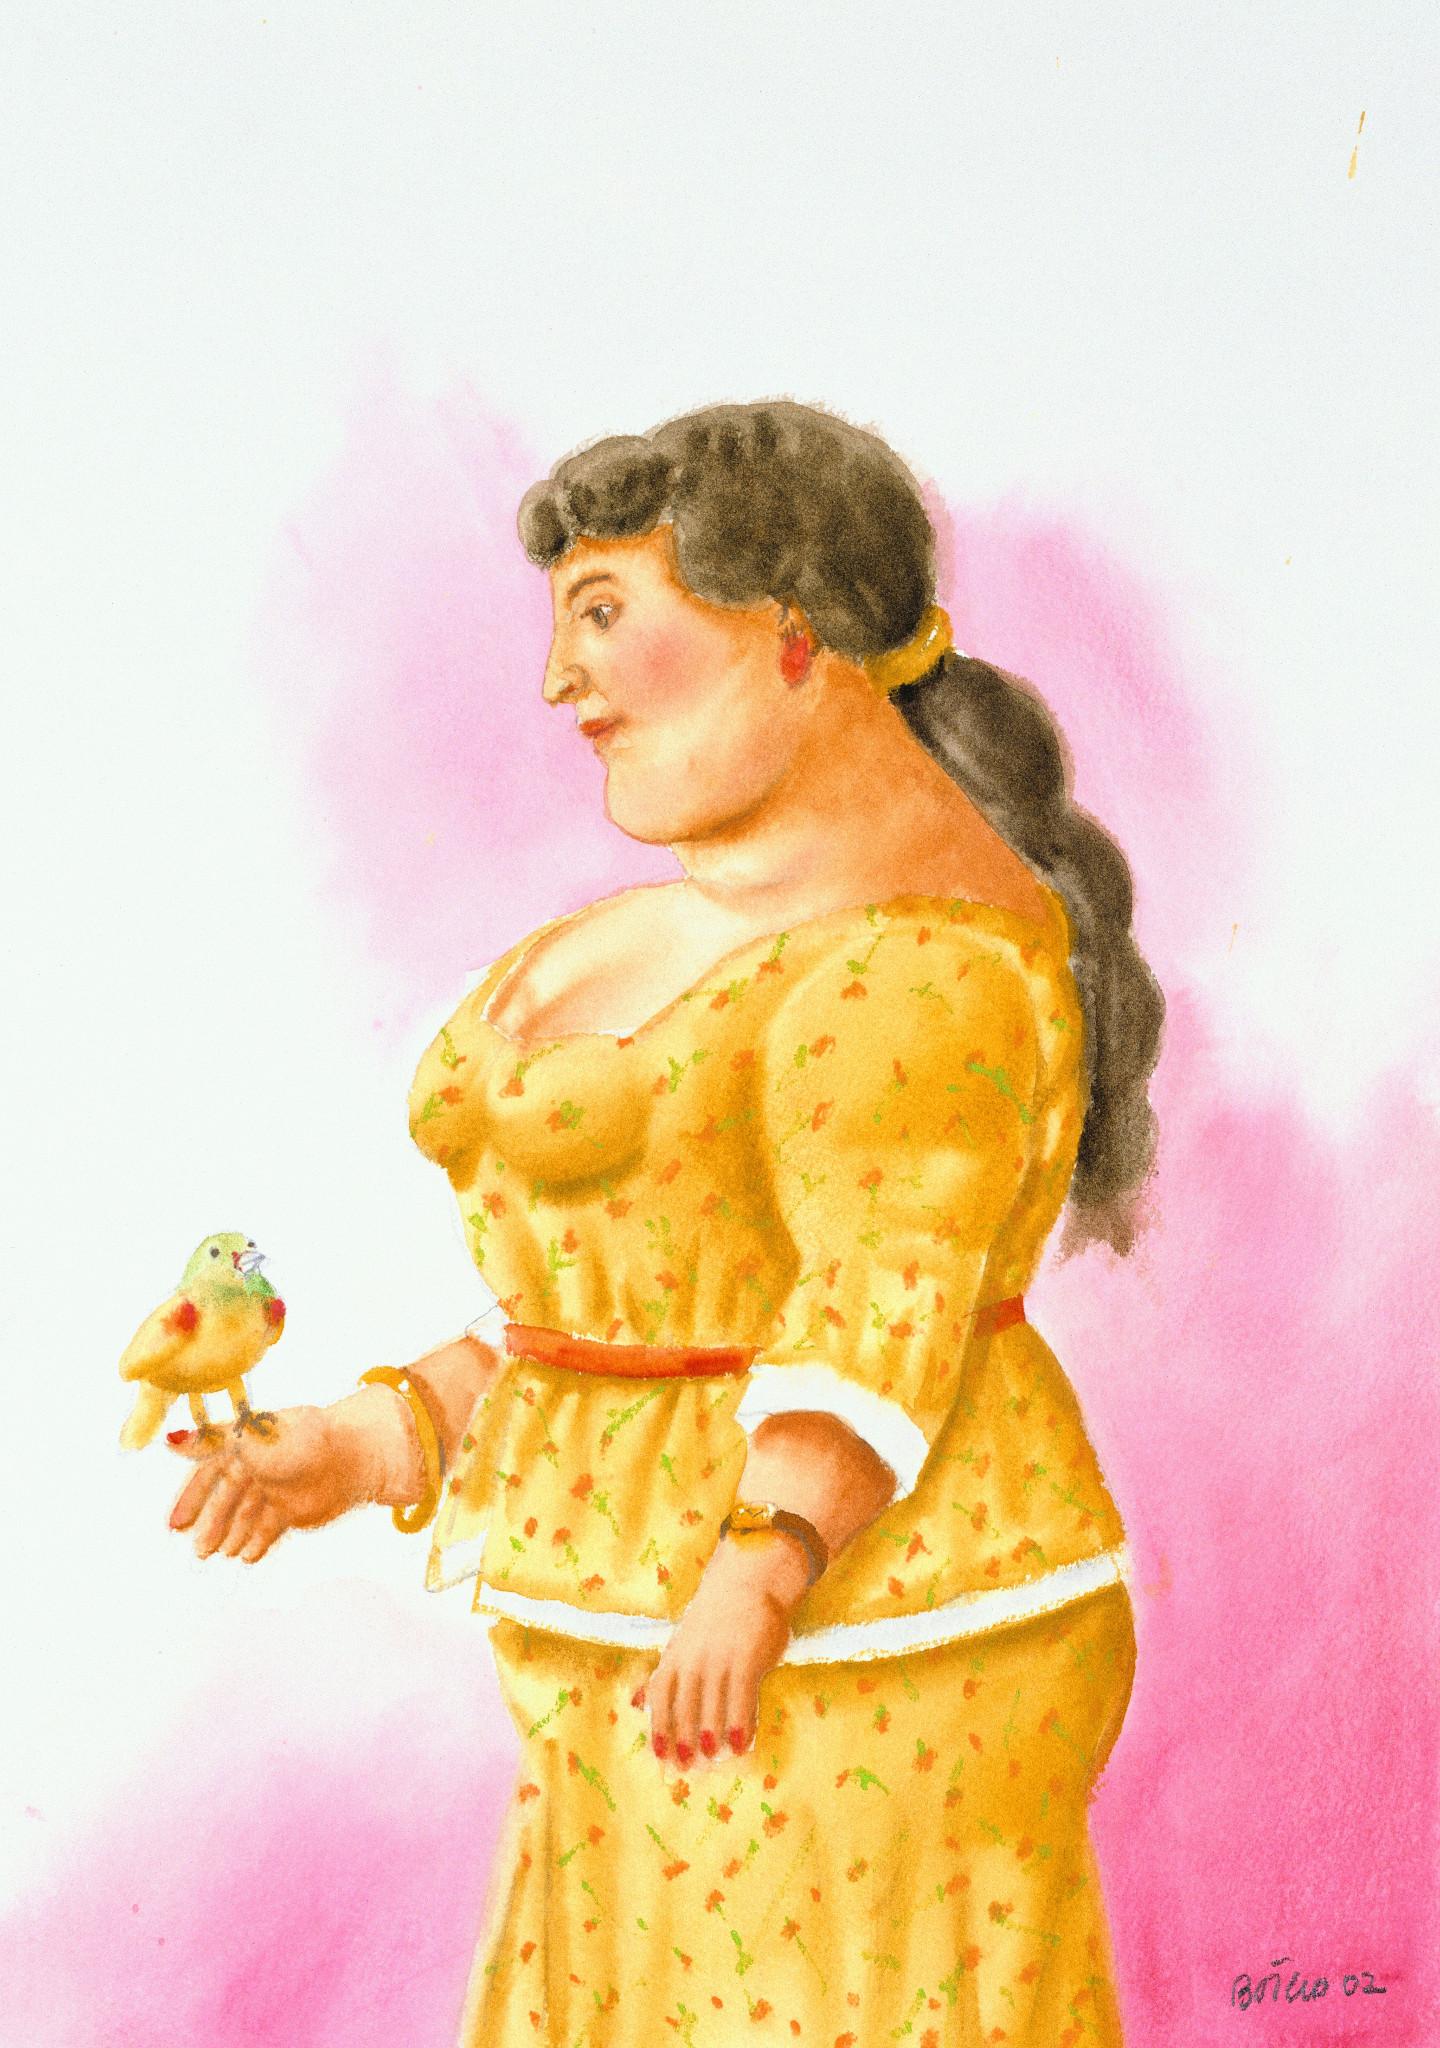 Un homenaje a la figura femenina